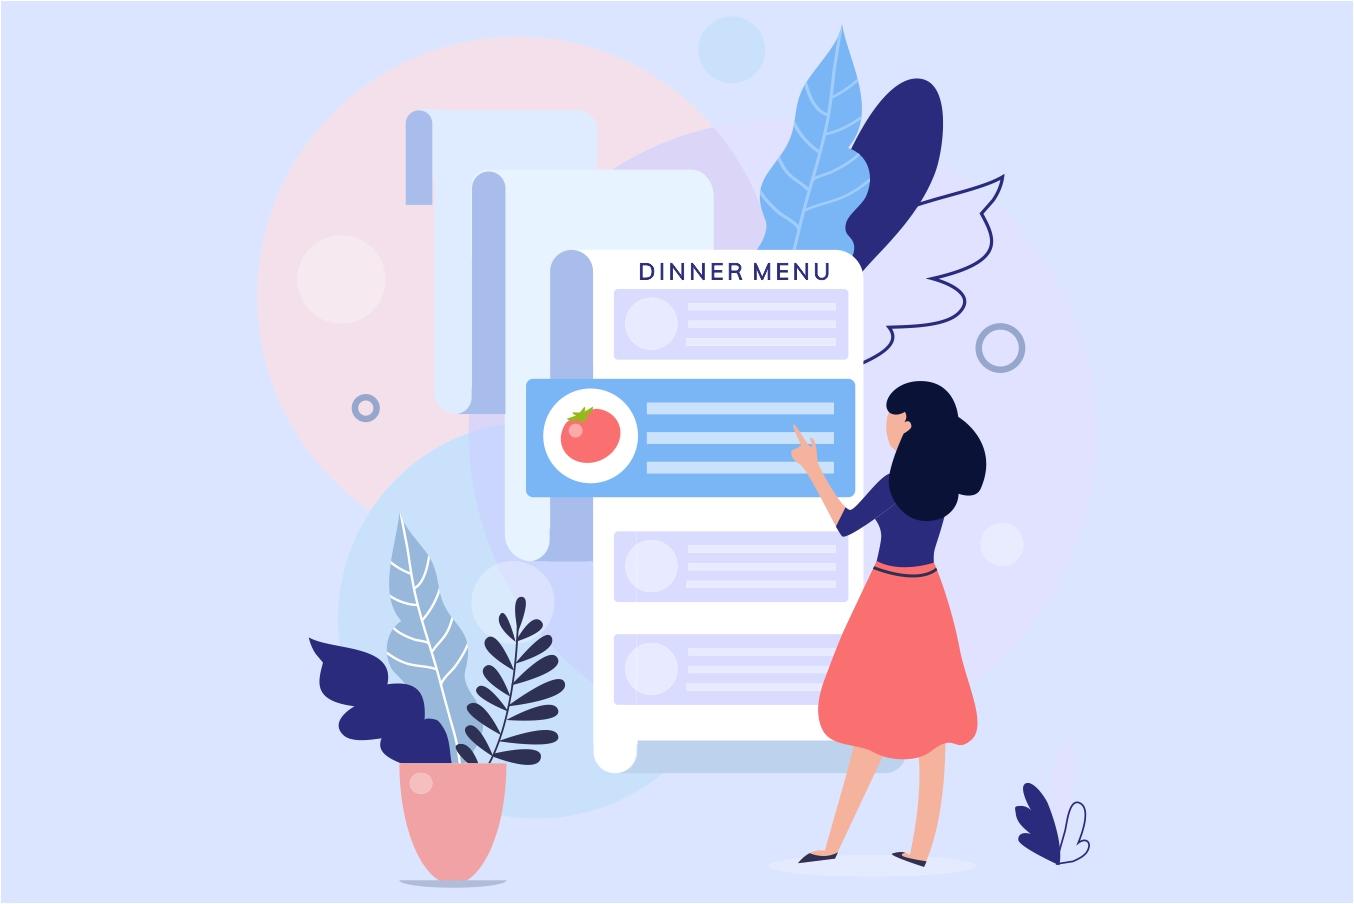 monthly menu plan for dinner